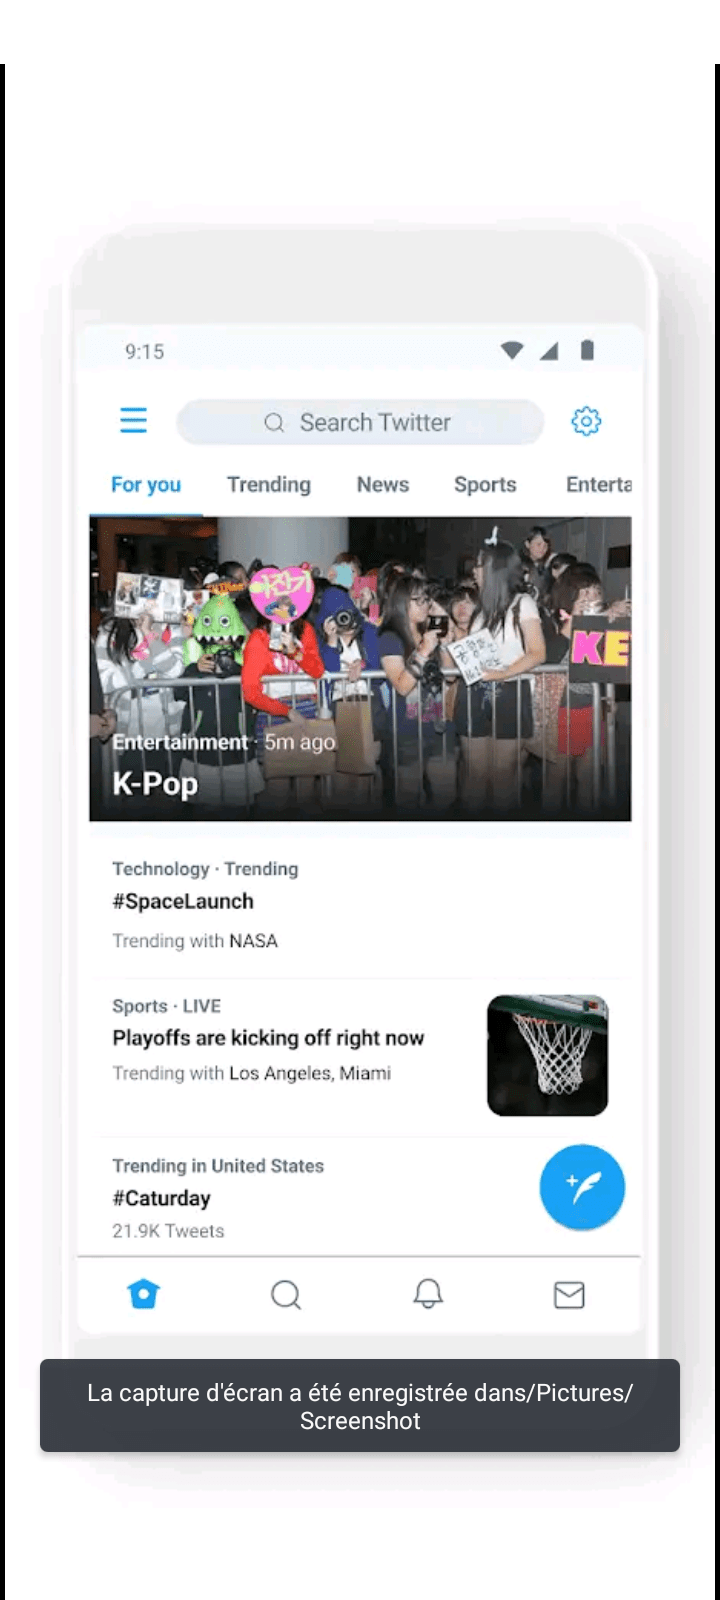 تحميل تويتر الذهبي Twitter Plus APK